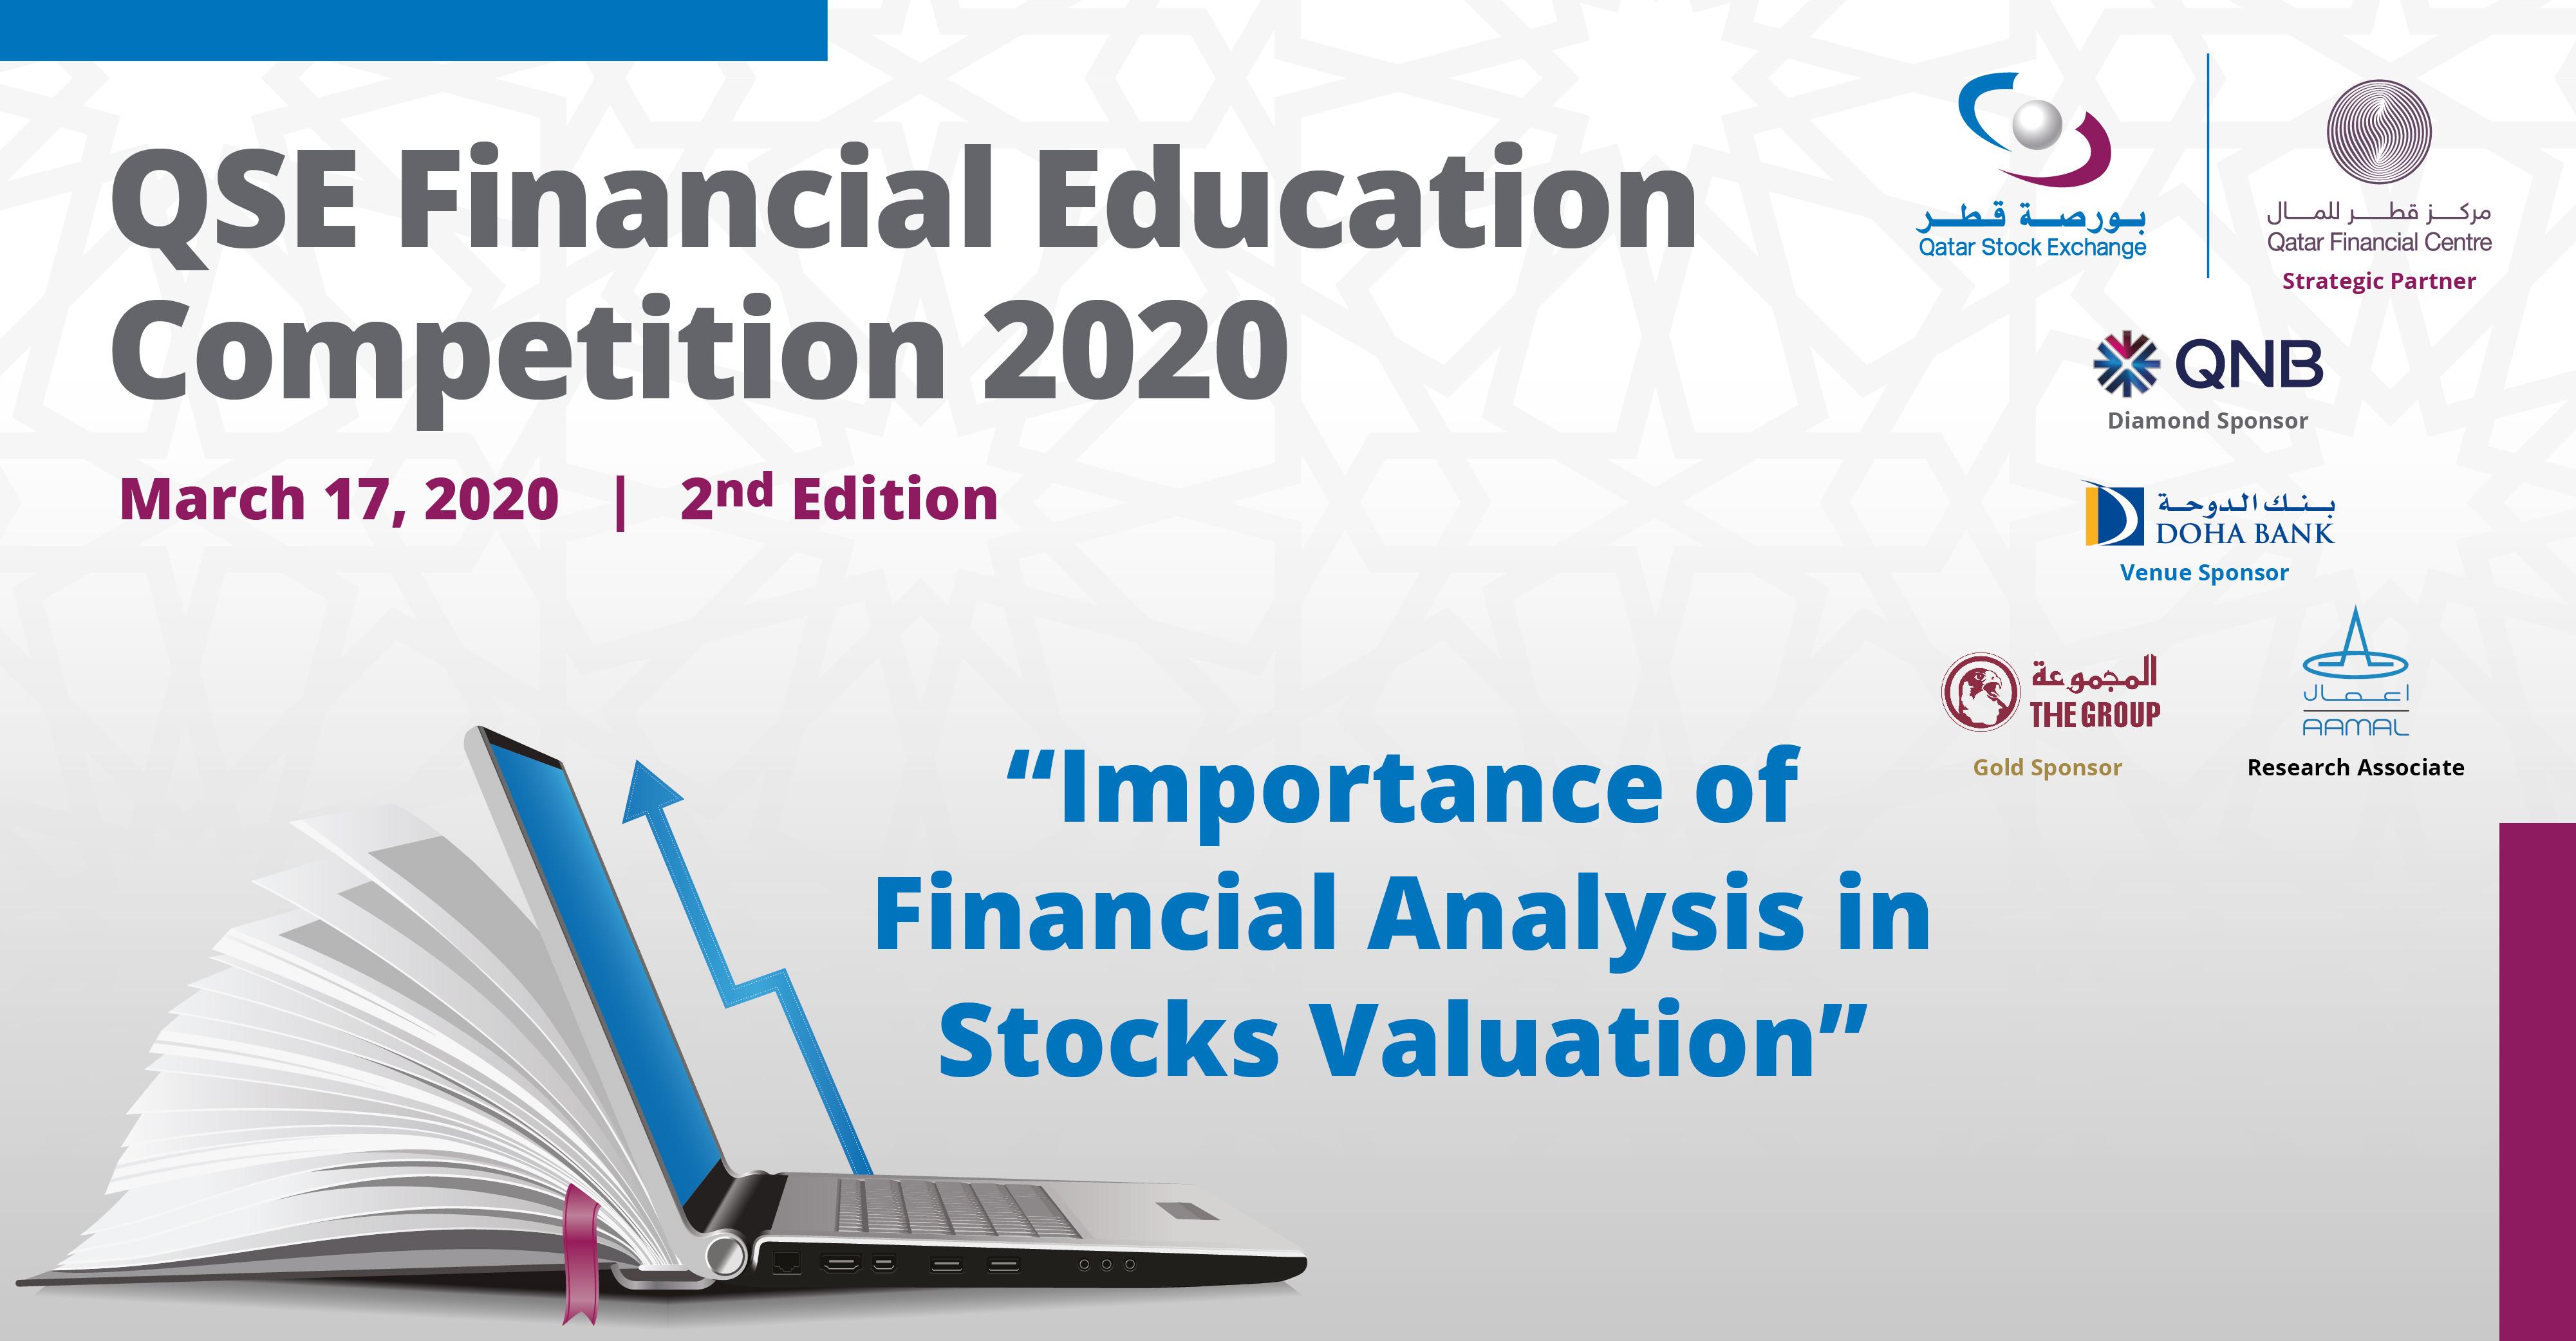 QSE Financial Education Competition